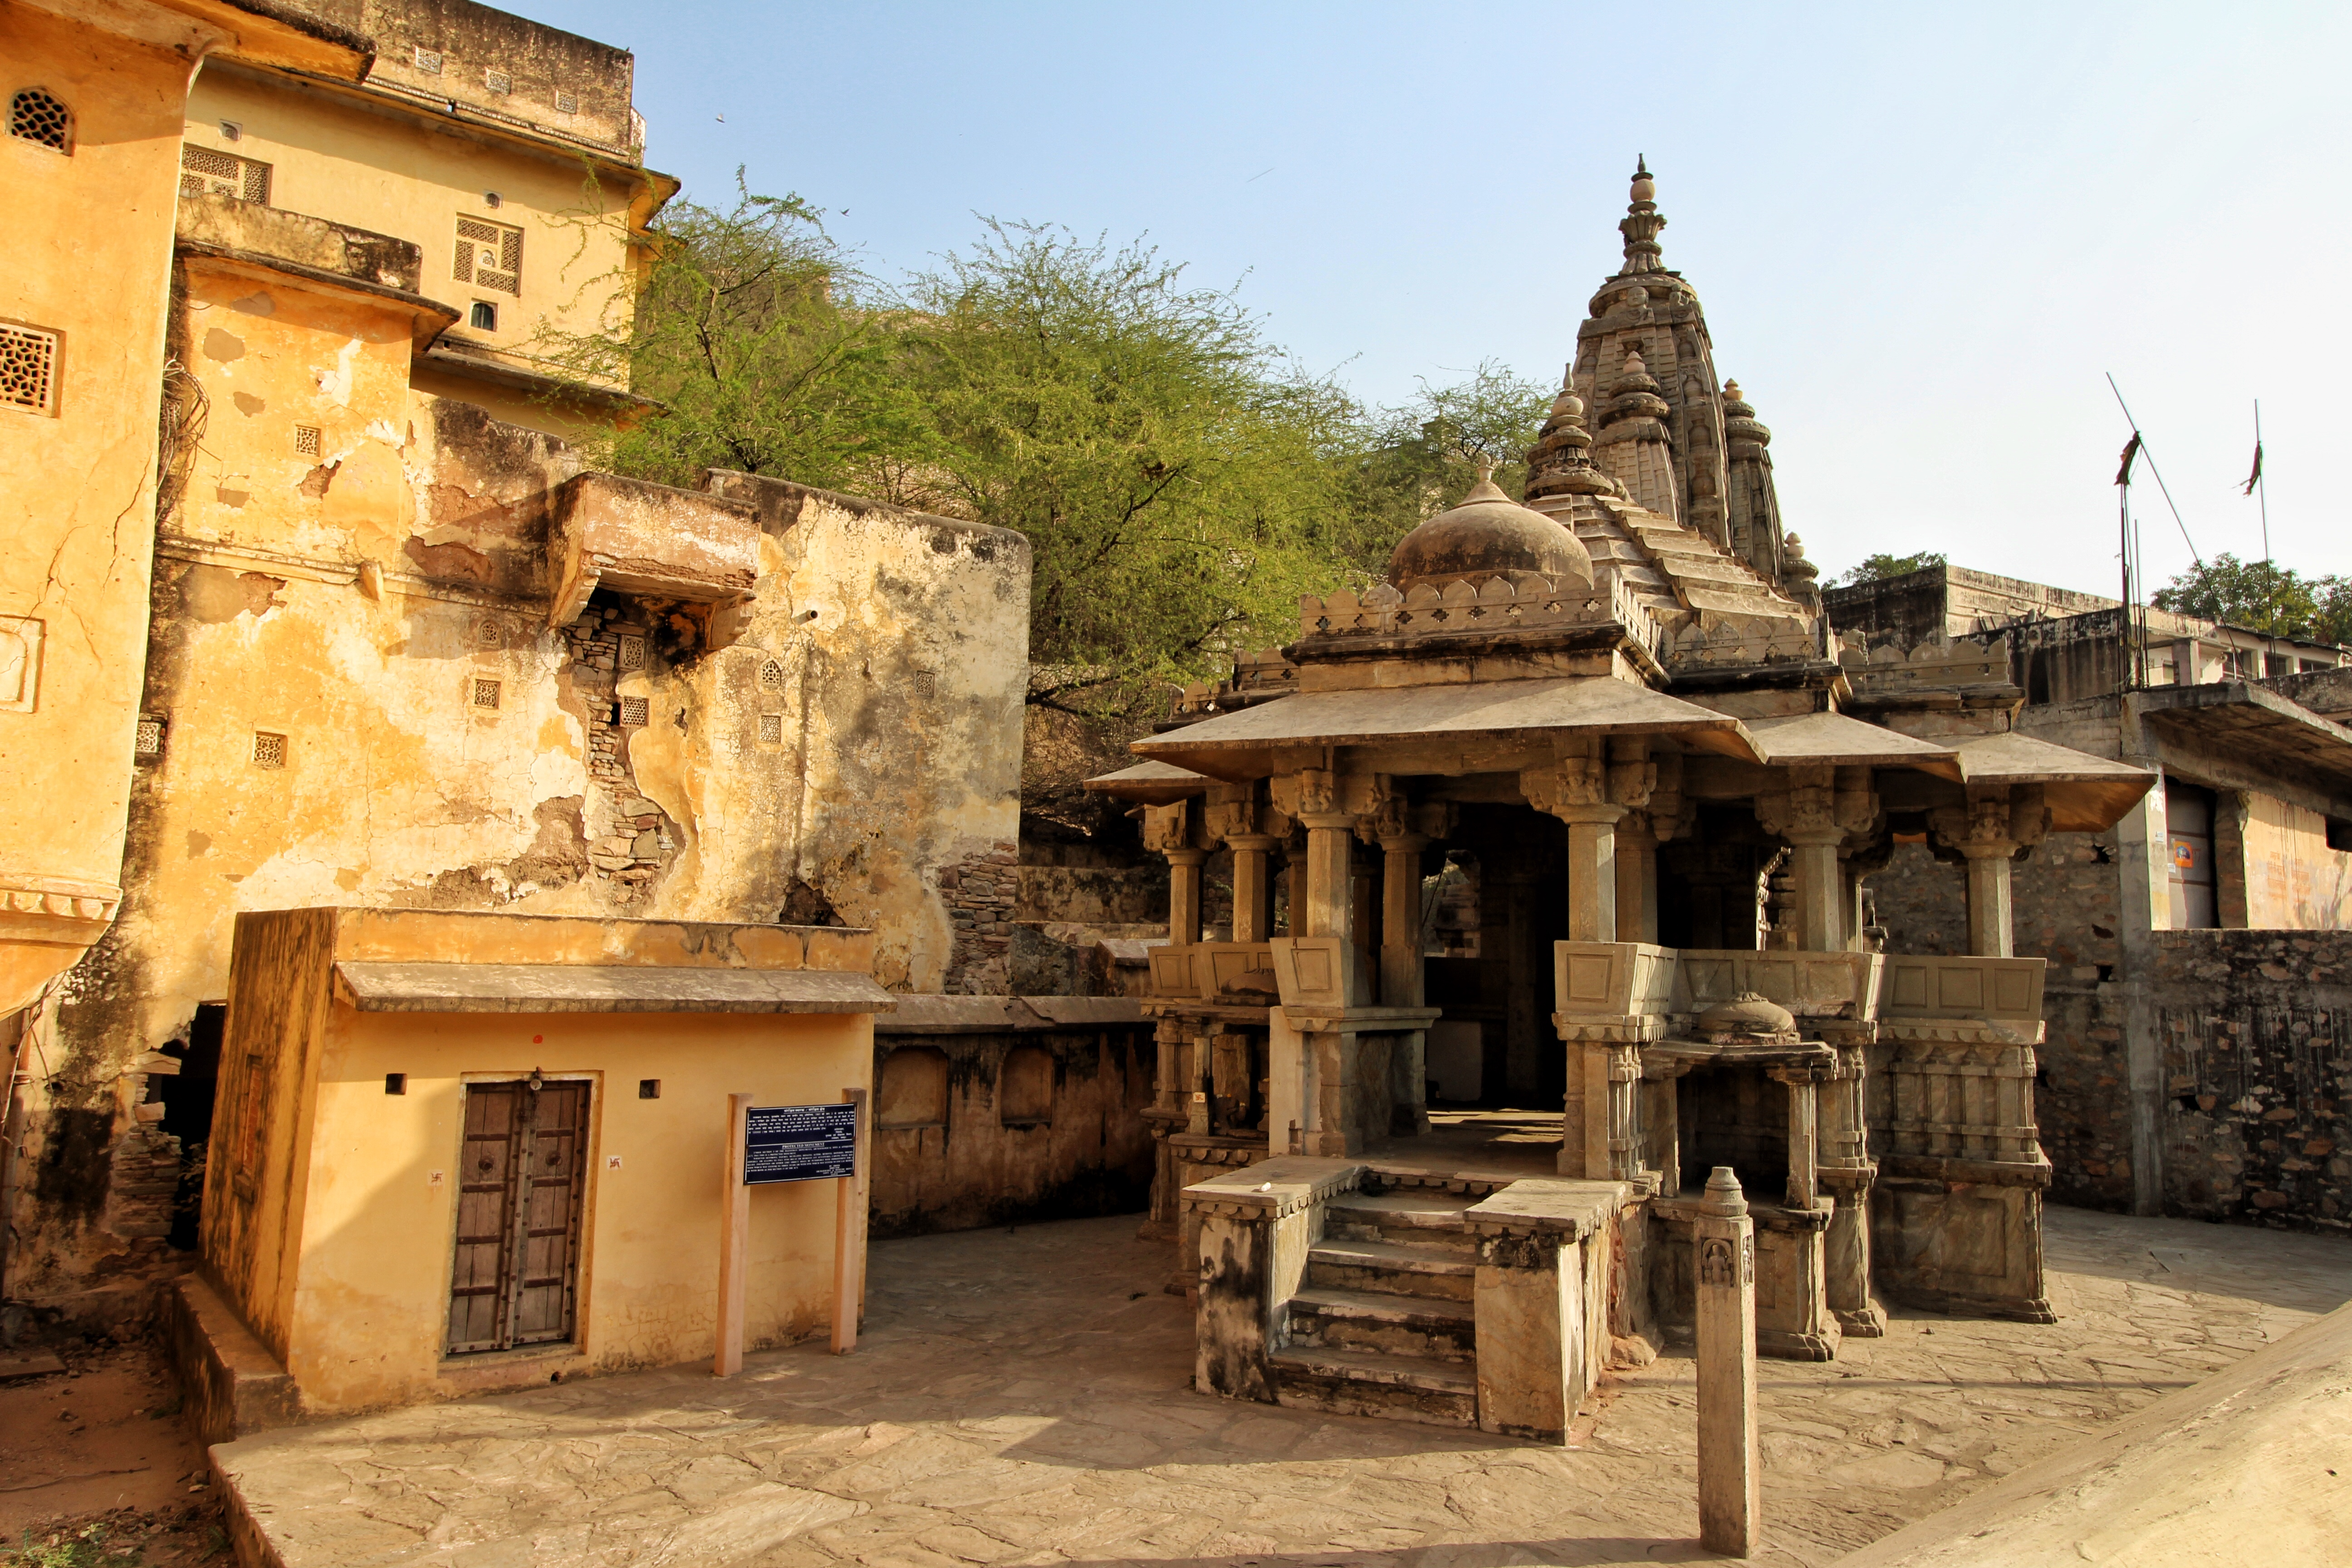 Amer, Rajasthan, India